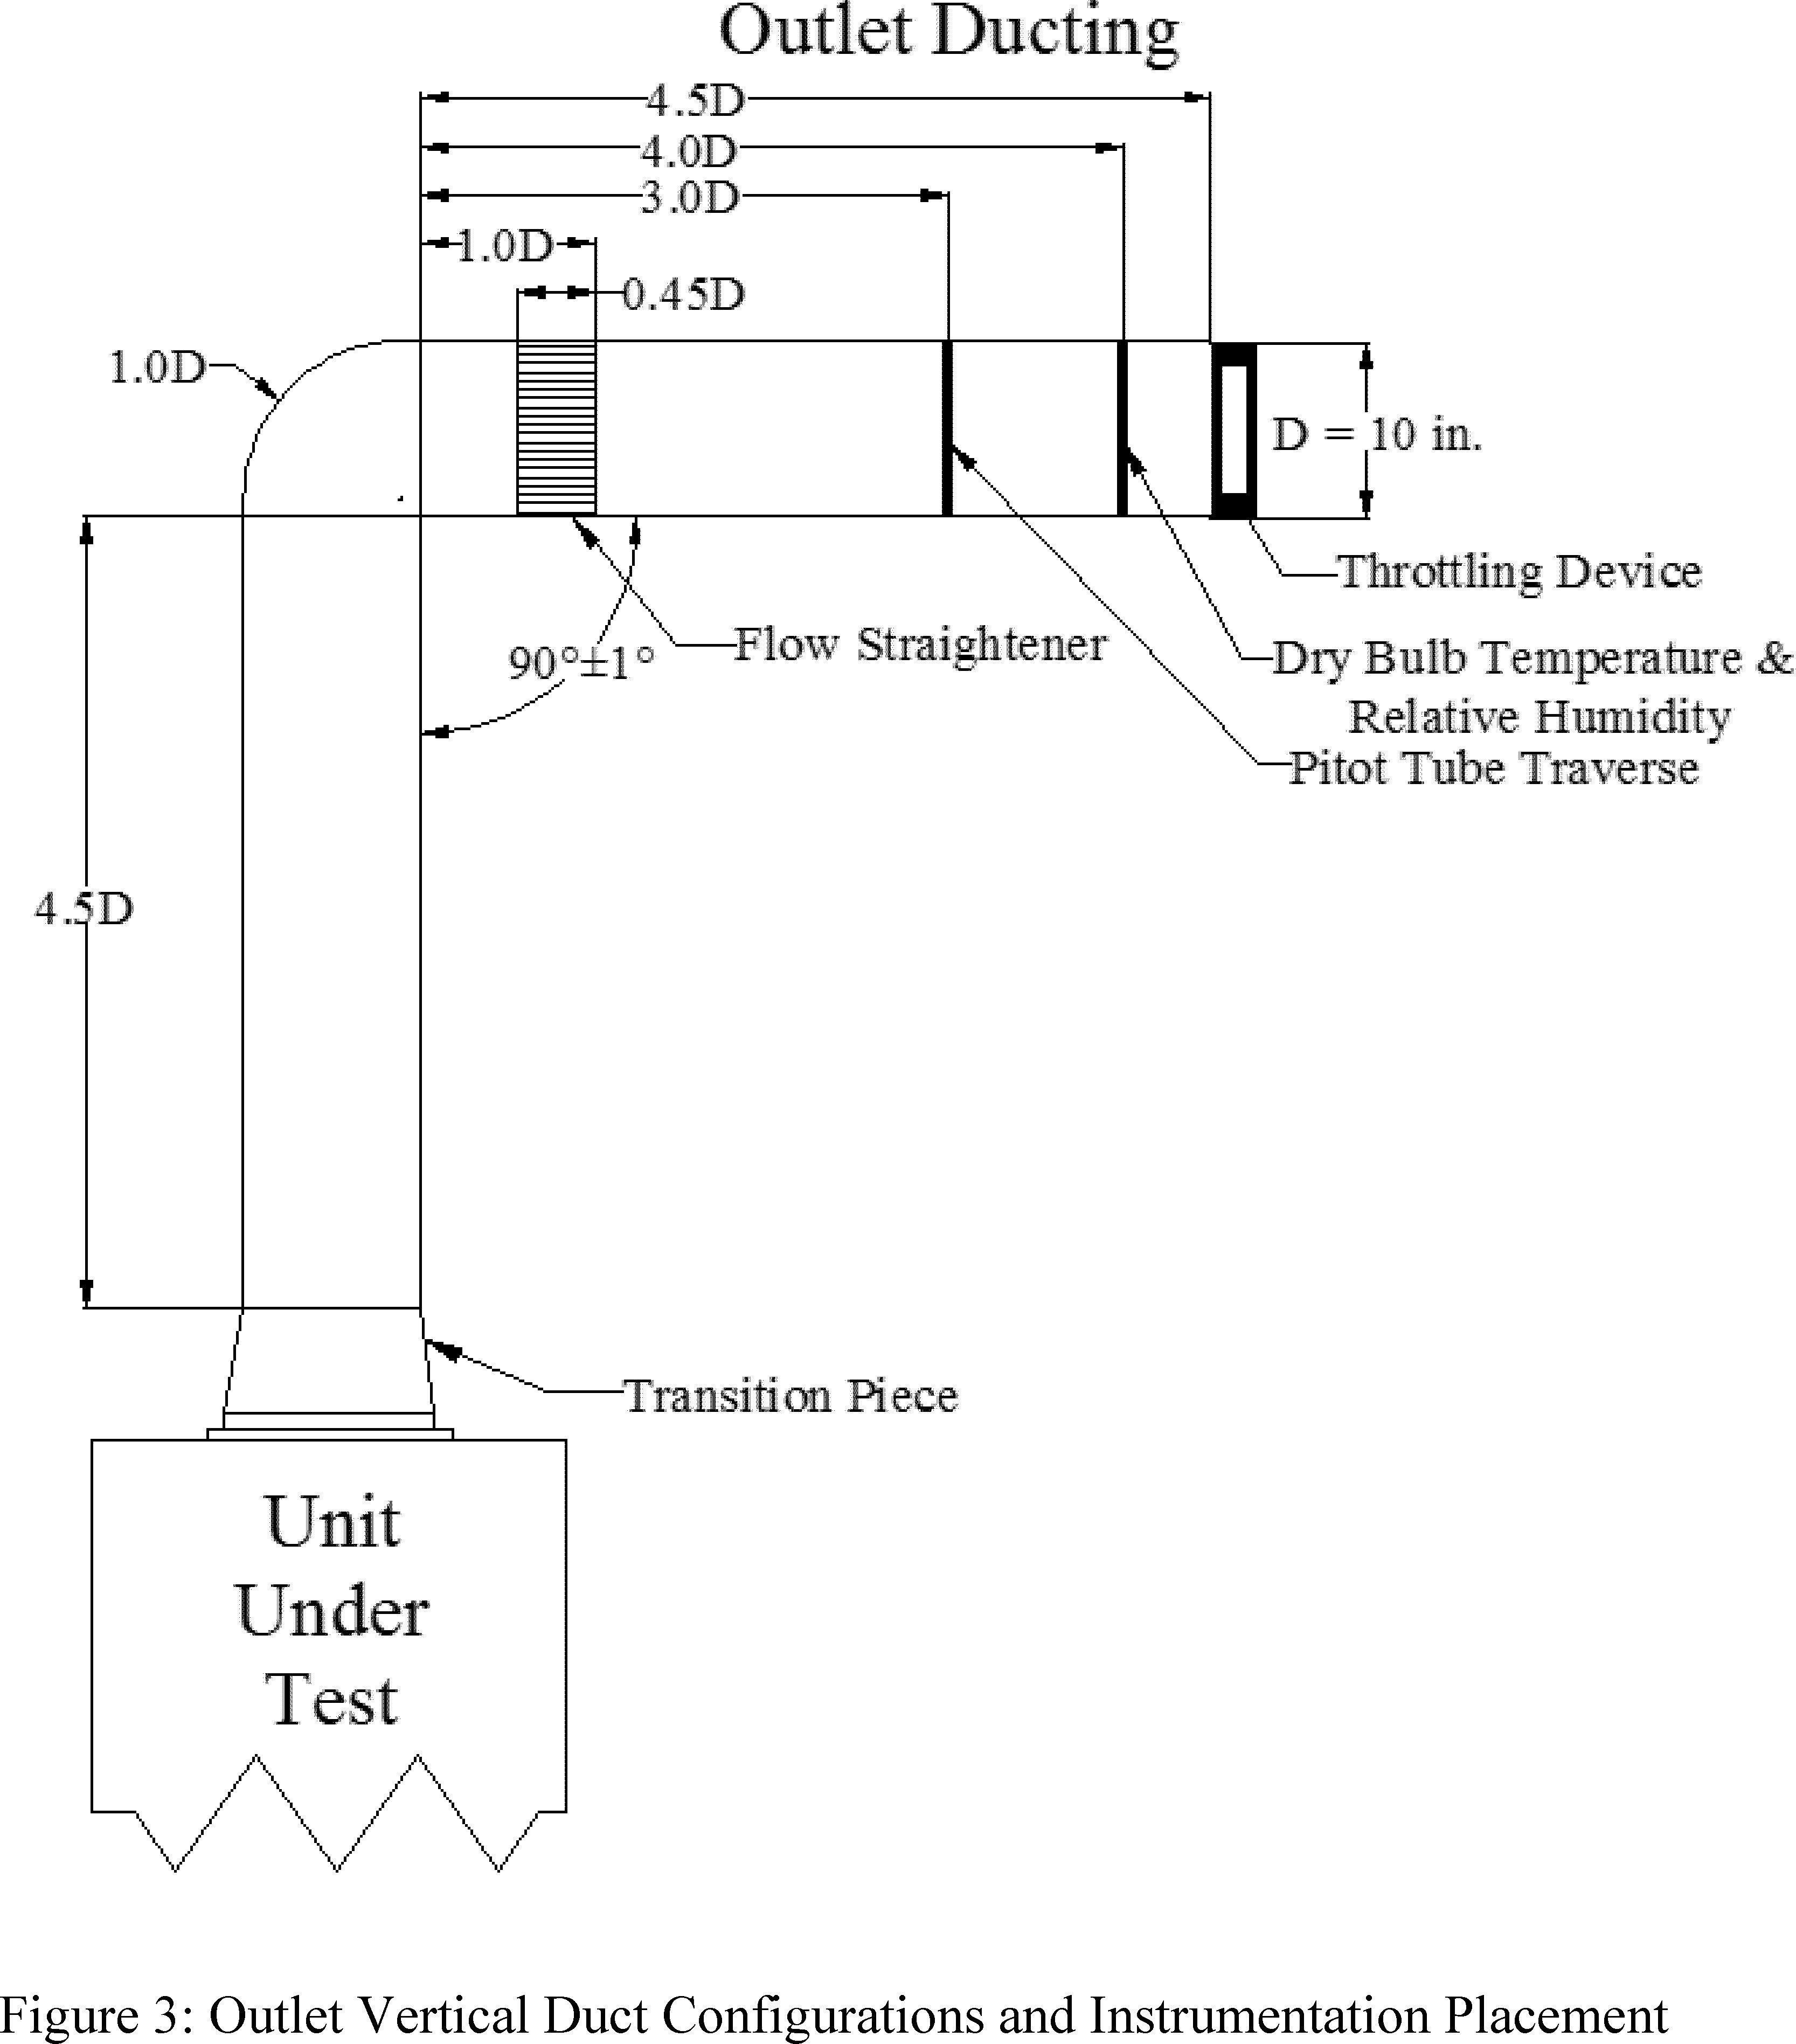 97 Jeep Grand Cherokee Headlight Switch Wiring Diagram